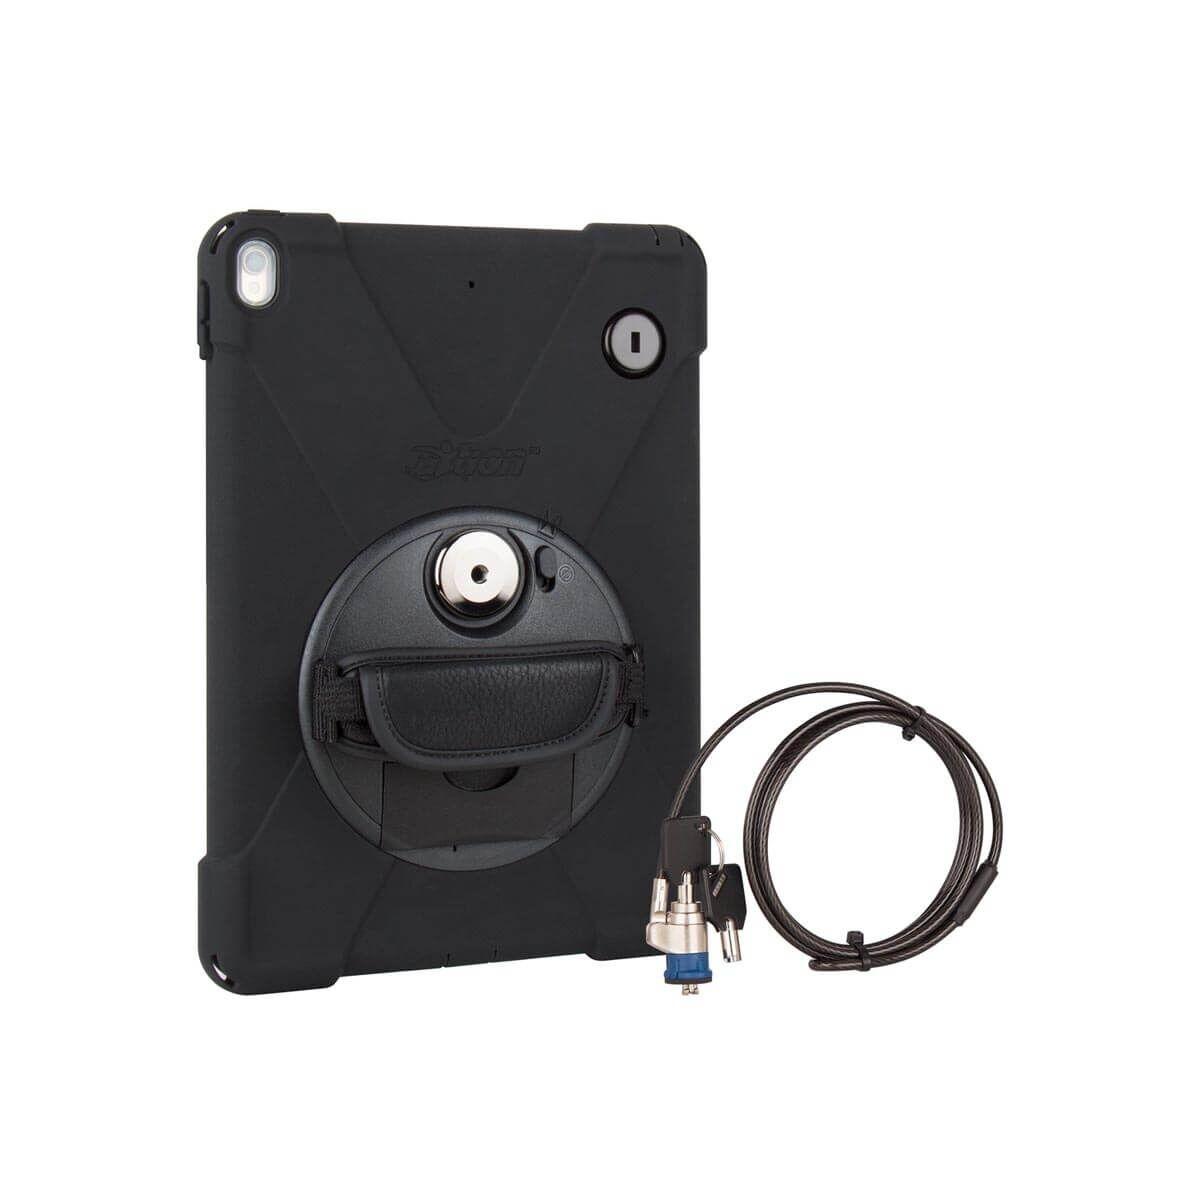 THE JOY FACTORY Protection semi-etanche securisee - iPad Pro 10.5